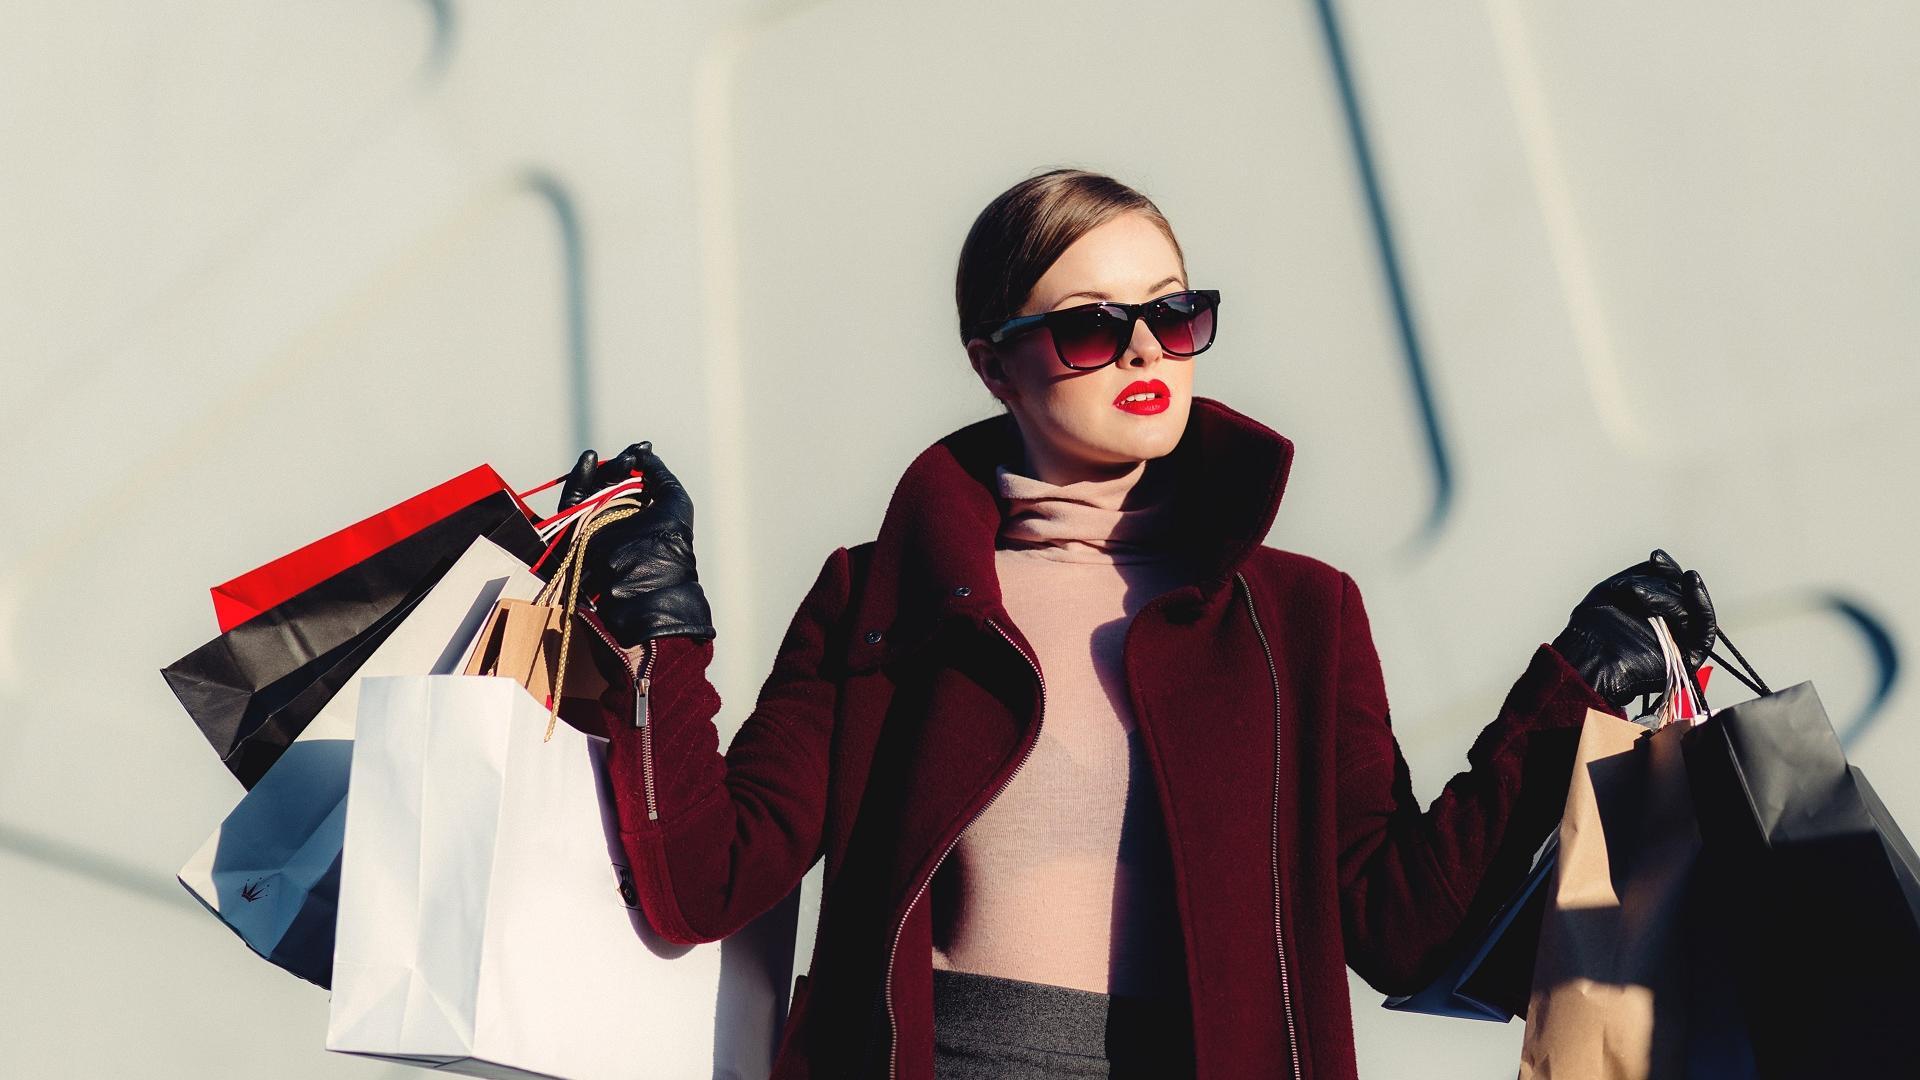 Frau mit Shopping-Beuteln